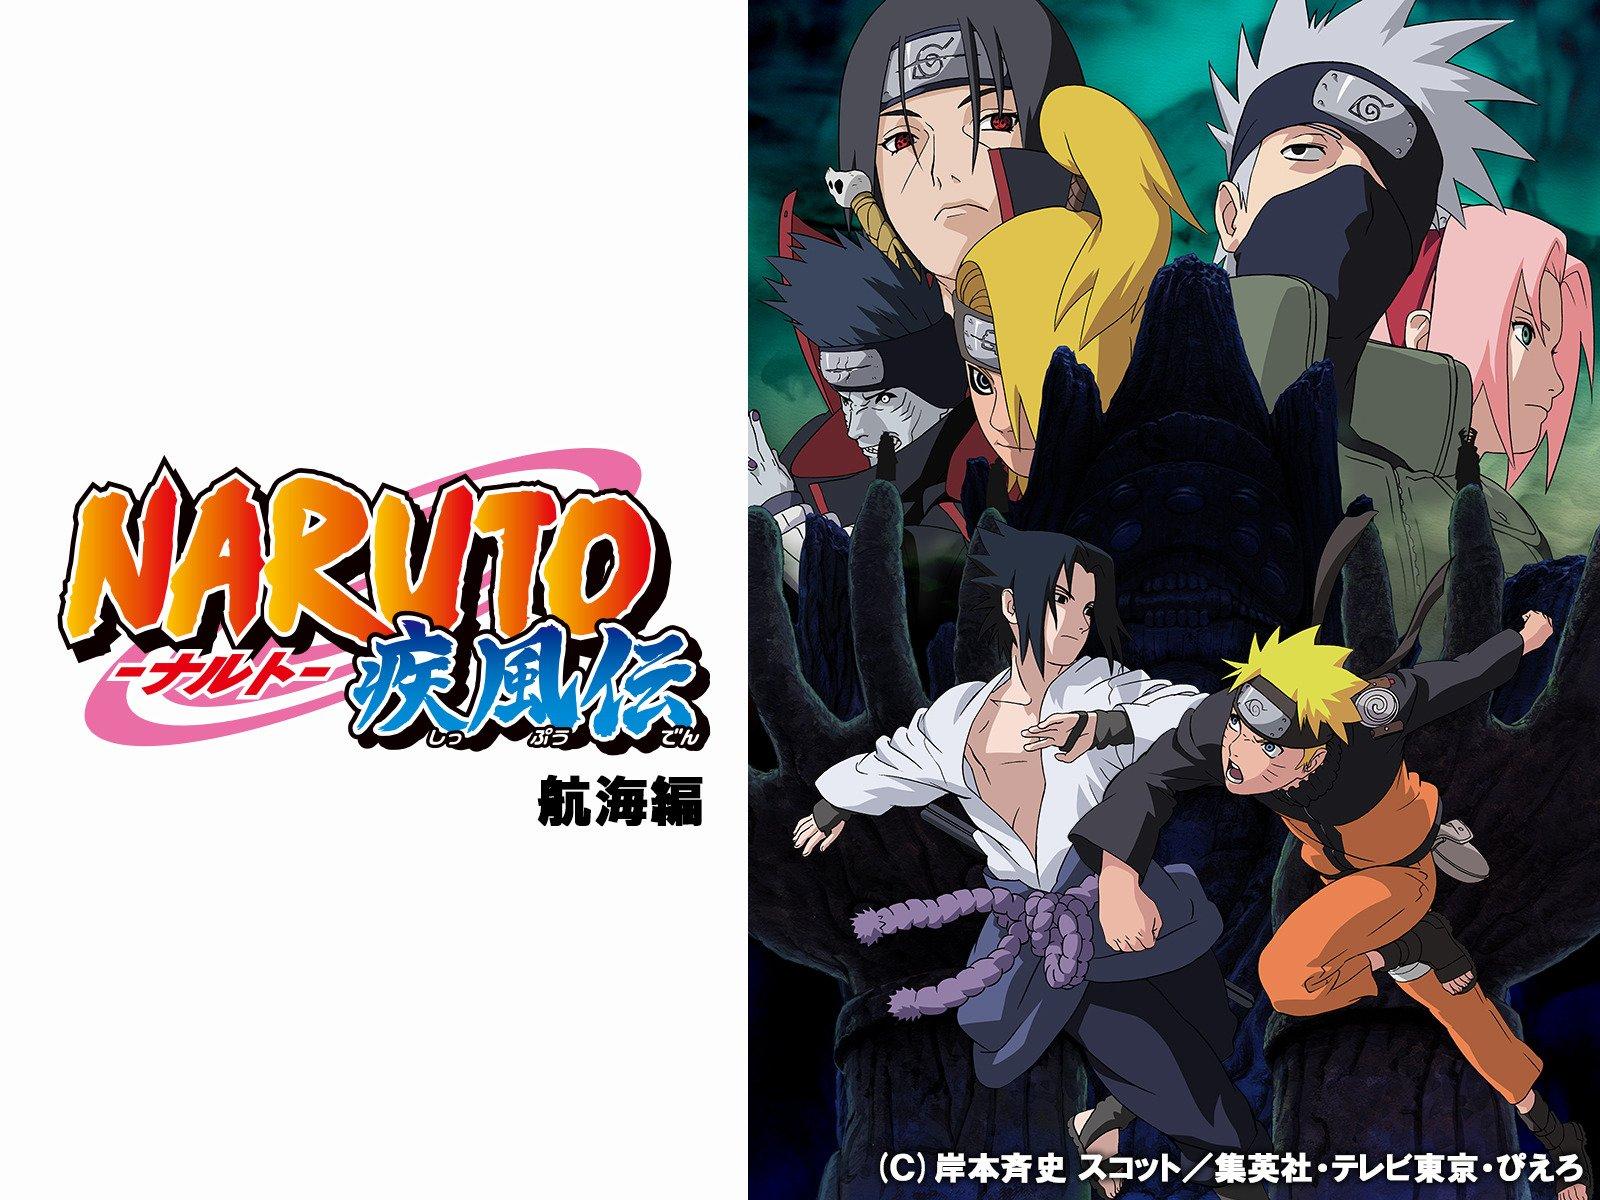 Amazon Co Jp Naruto ナルト 疾風伝 忍界大戦編 1 を観る Prime Video